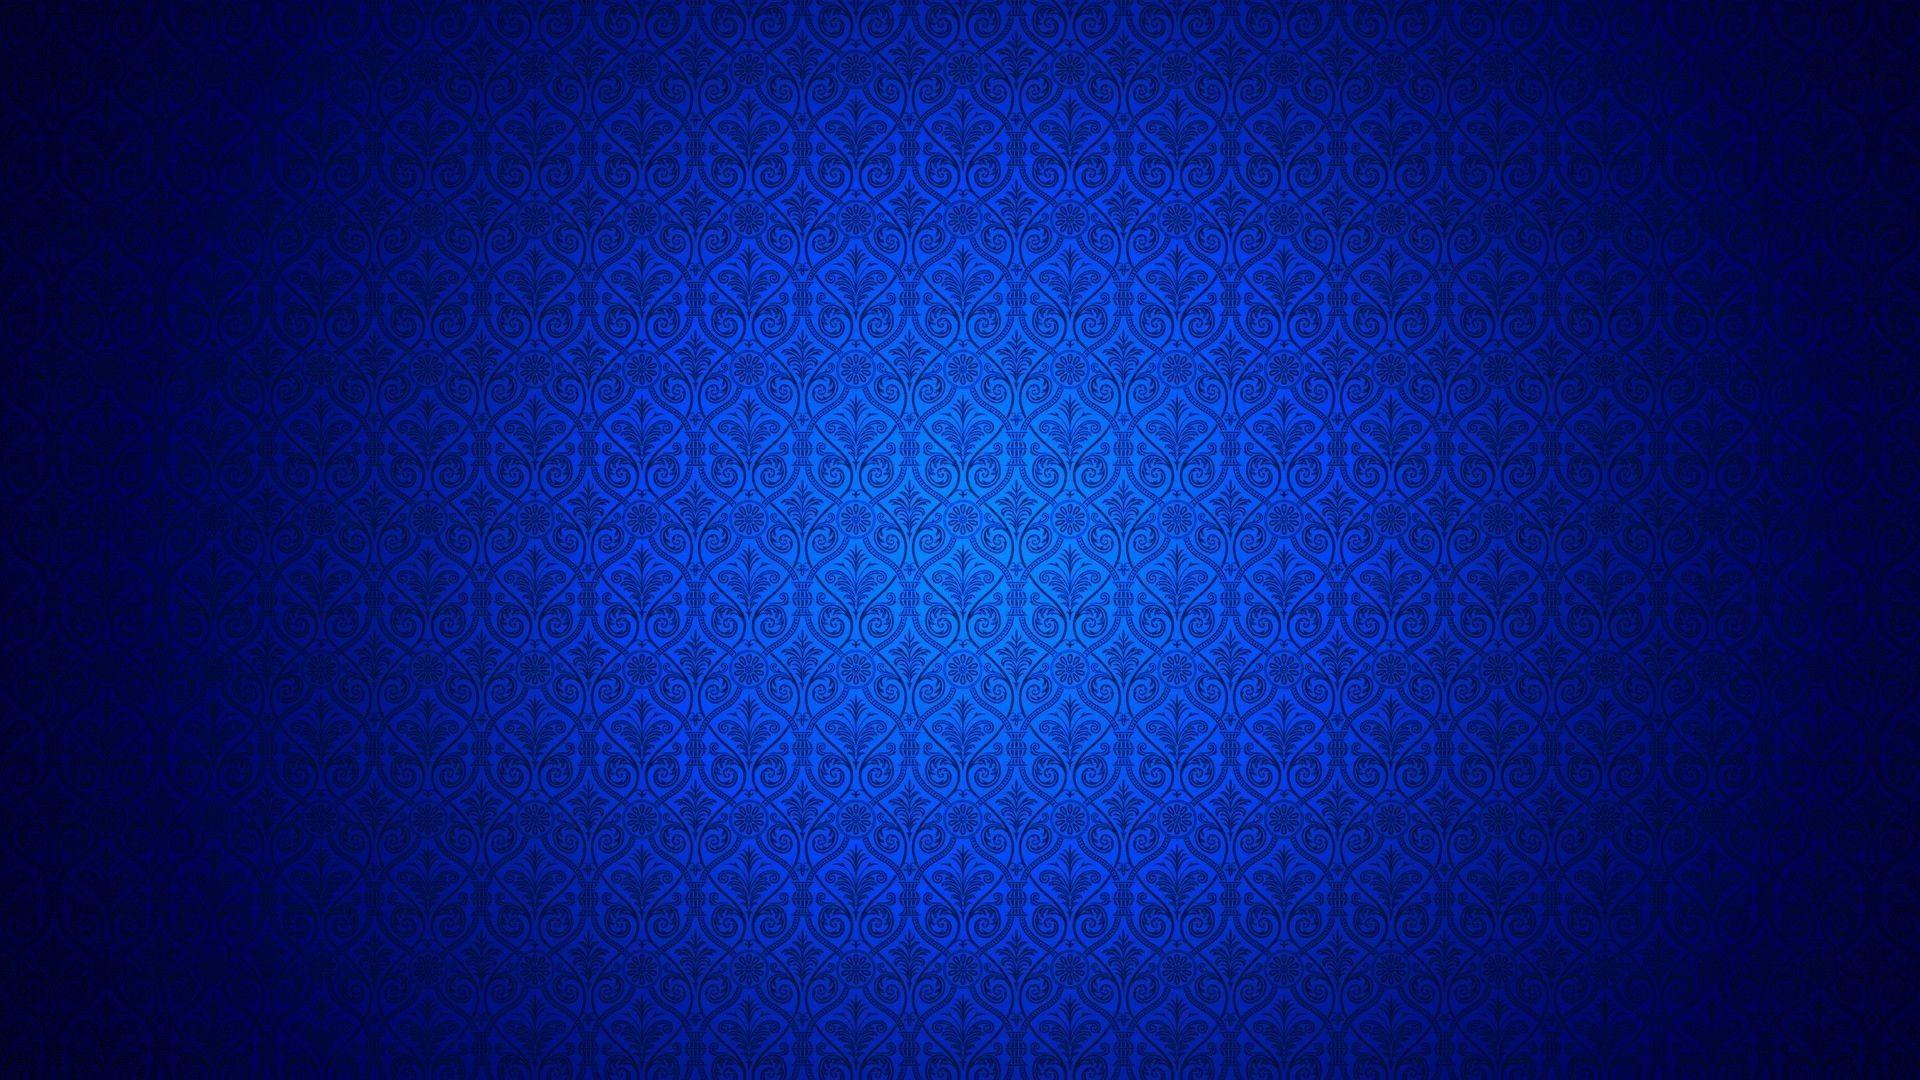 Blue Powerpoint Background Texture